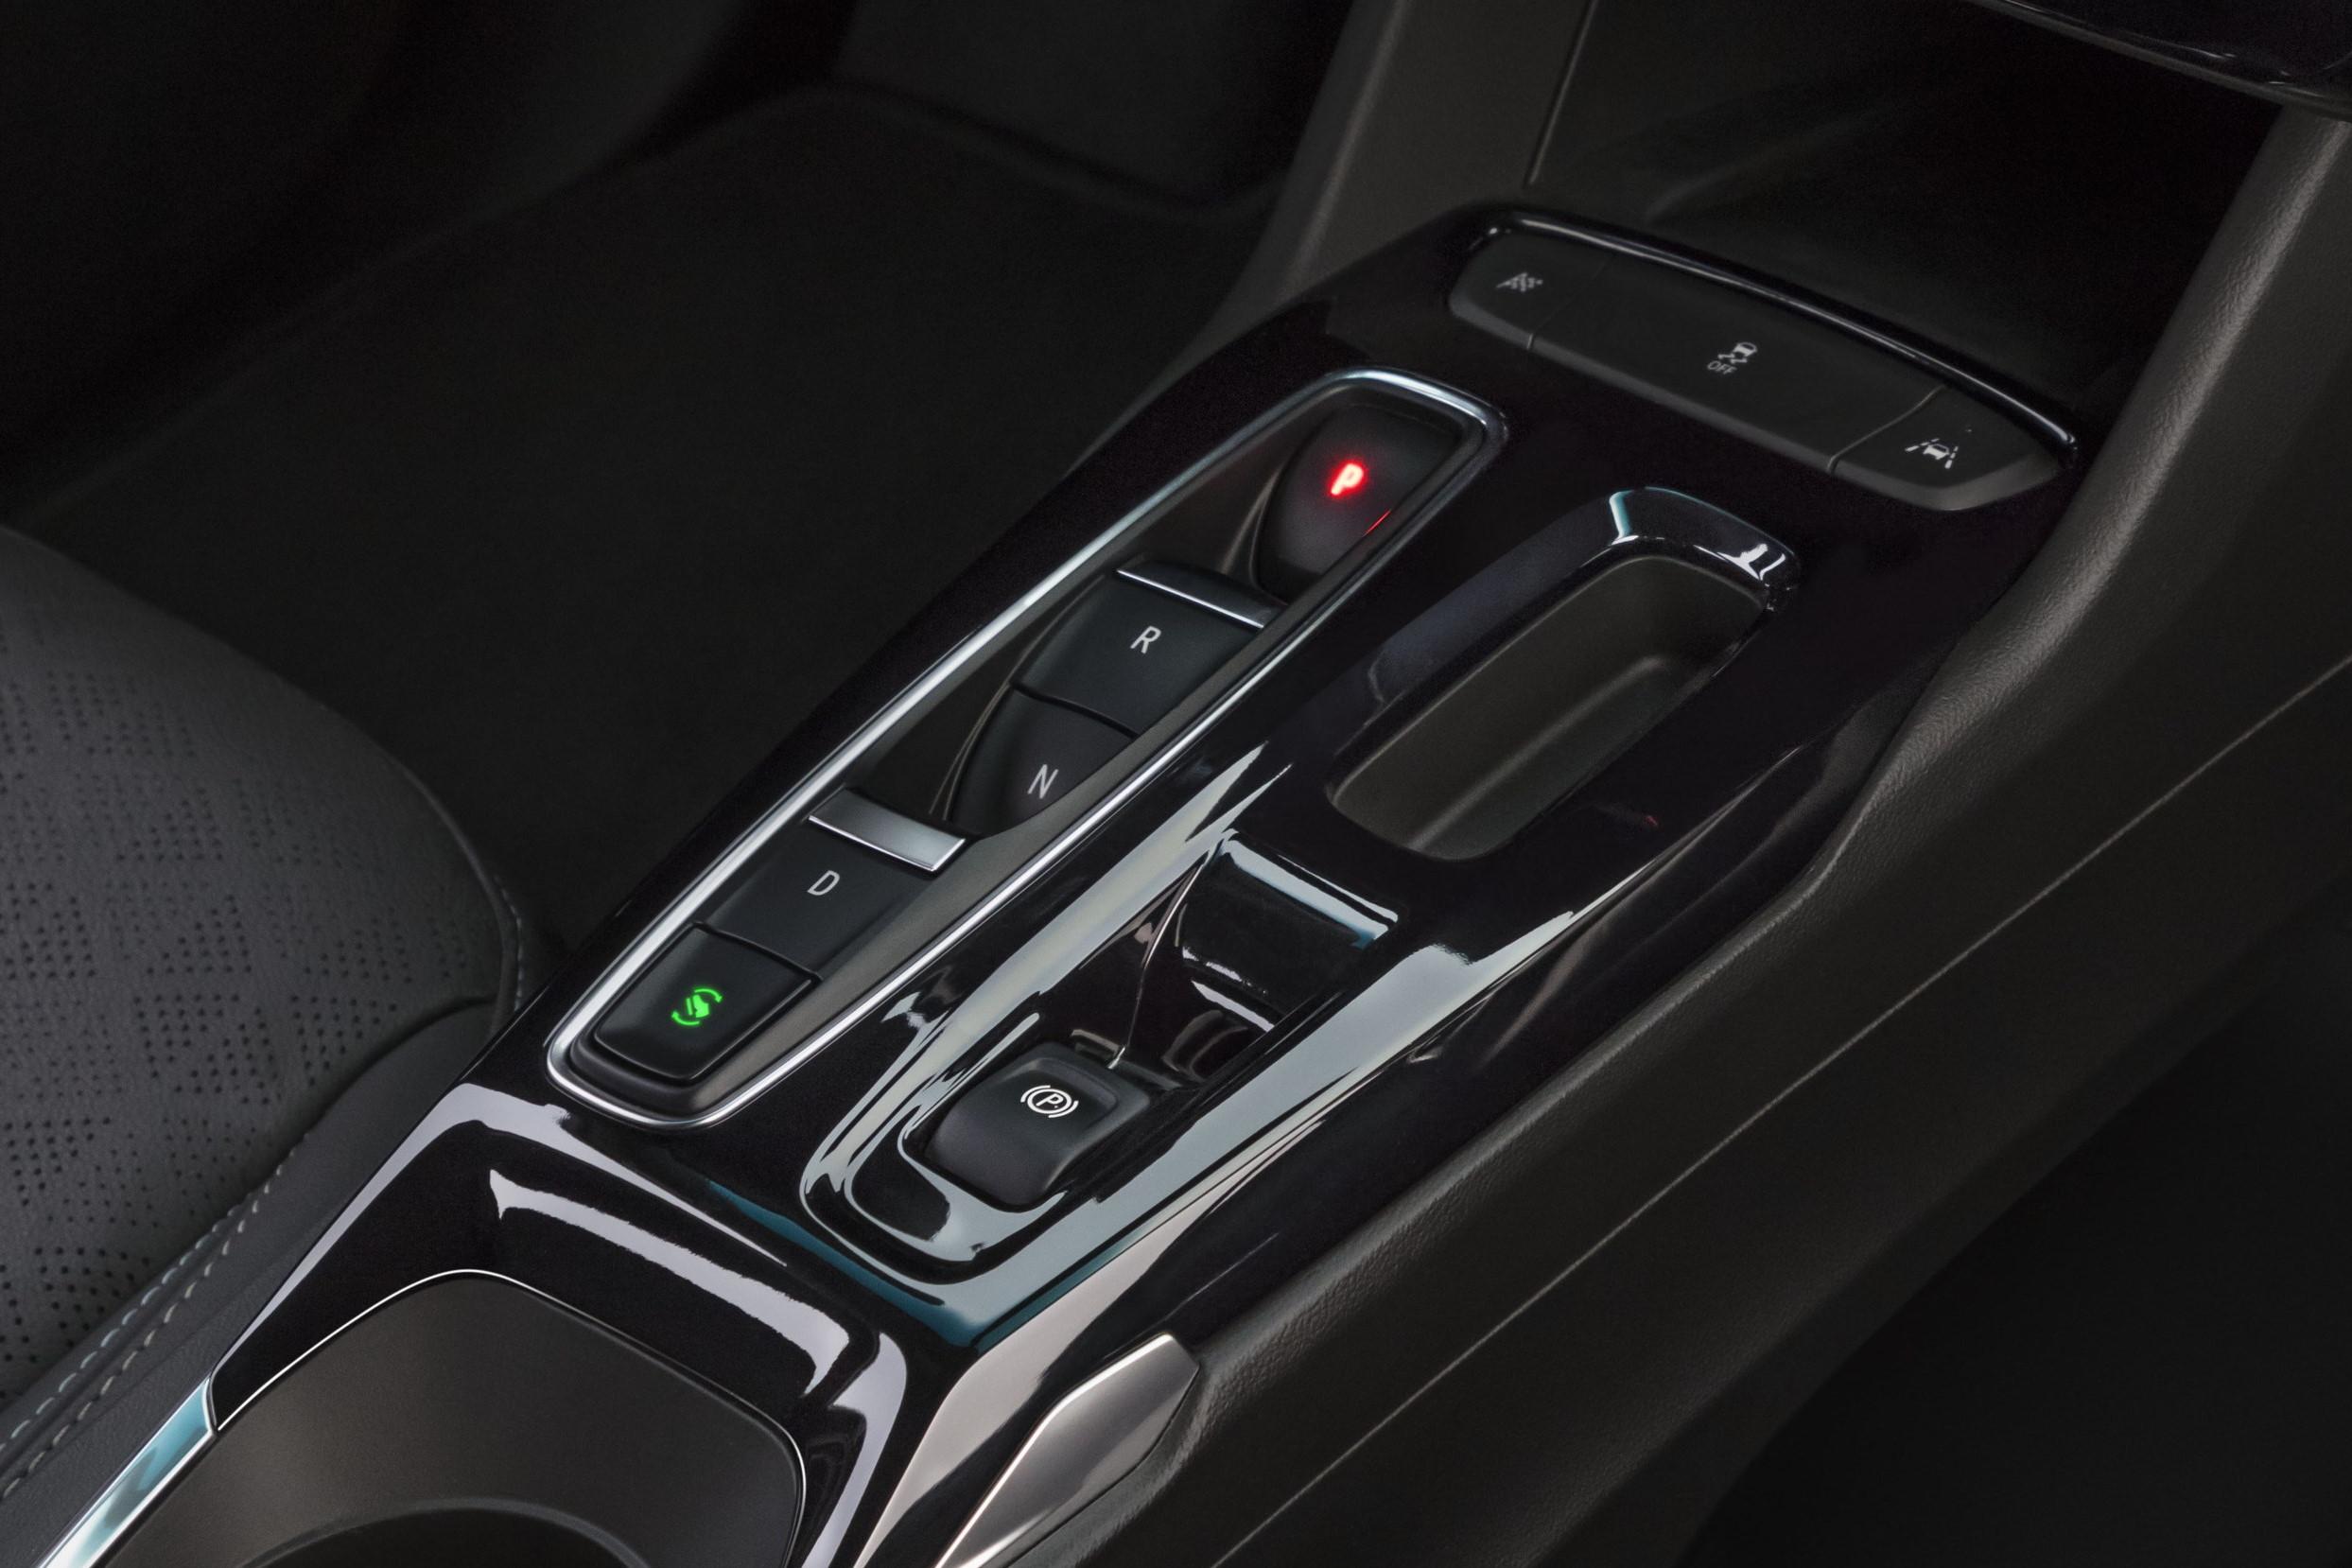 2022 Chevrolet Bolt EV центральная консоль